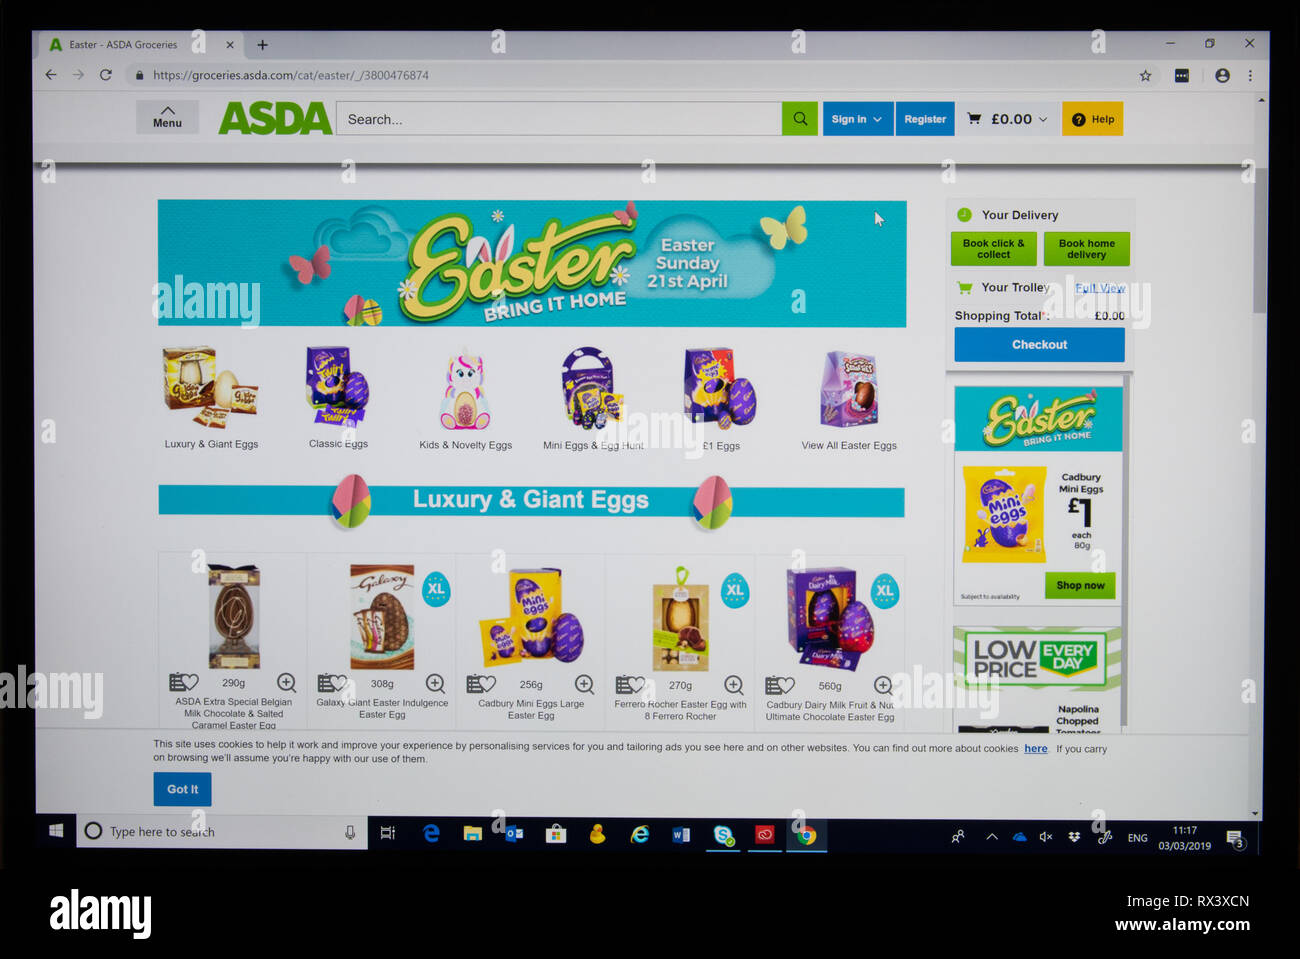 Asda online store captura de pantalla mostrando los huevos de Pascua Imagen De Stock